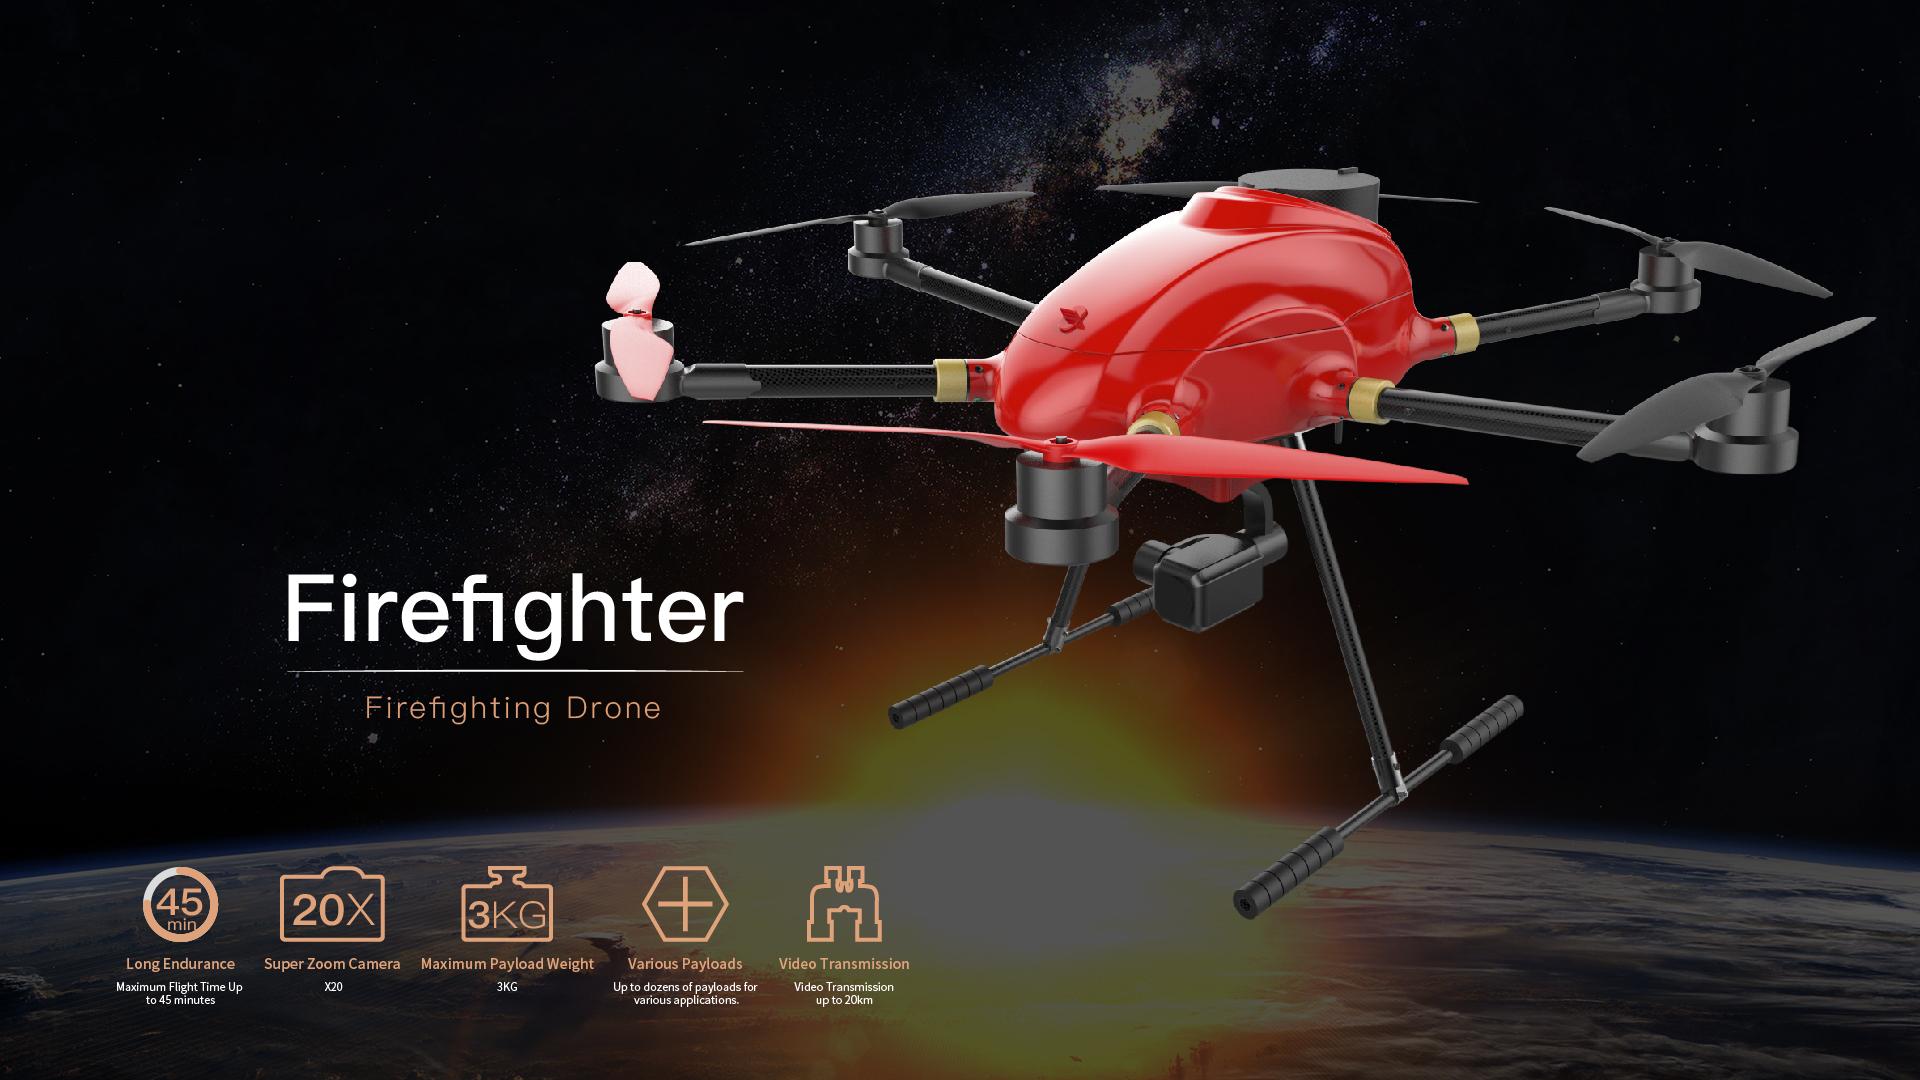 Firefighter Firefighting Solution